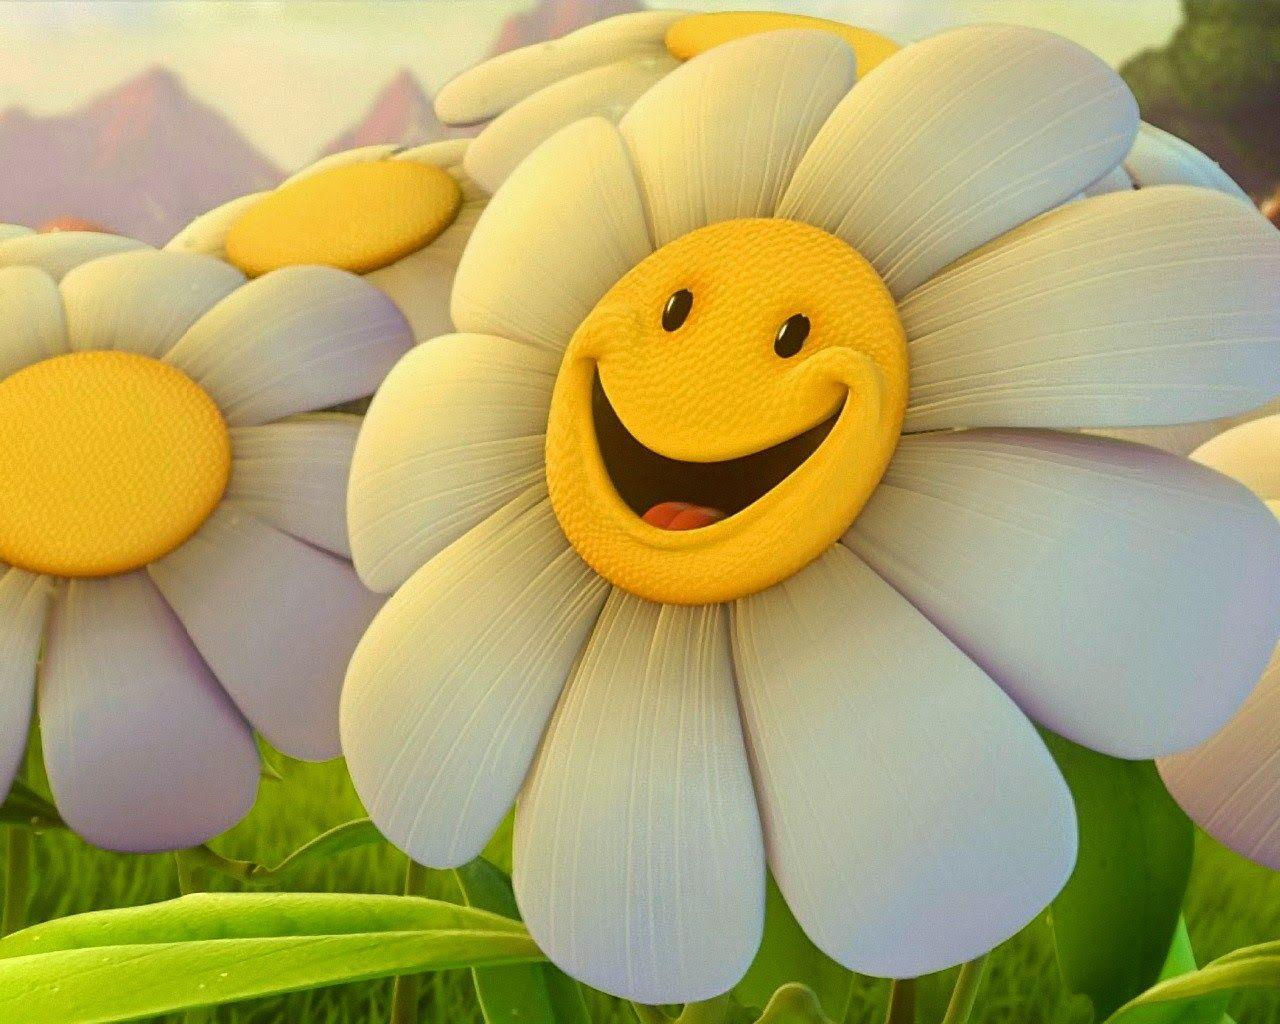 GAMBAR SENYUM LUCU WALLPAPER Senyum Indah Dan Cantik